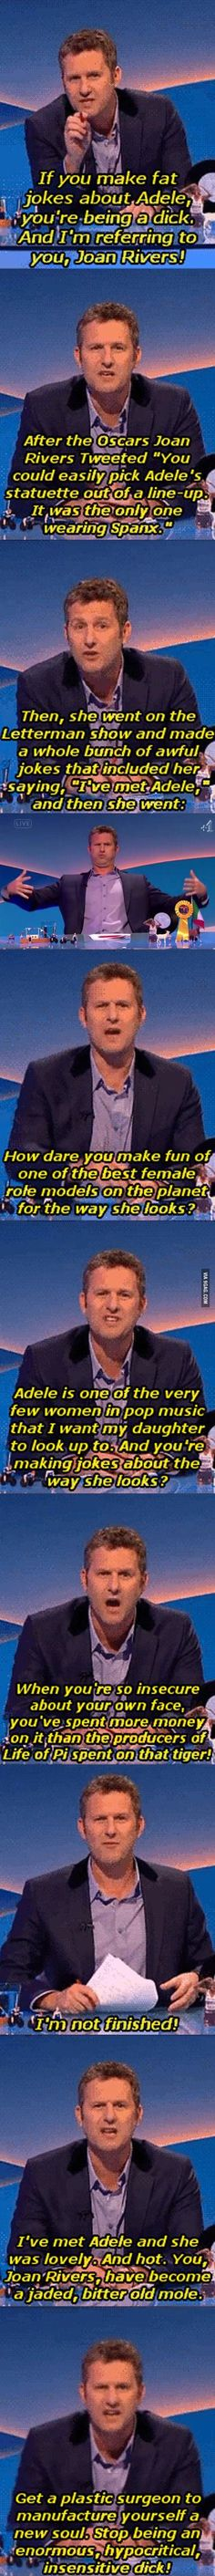 Comedian Destroys Joan Rivers Over Adele Comments...